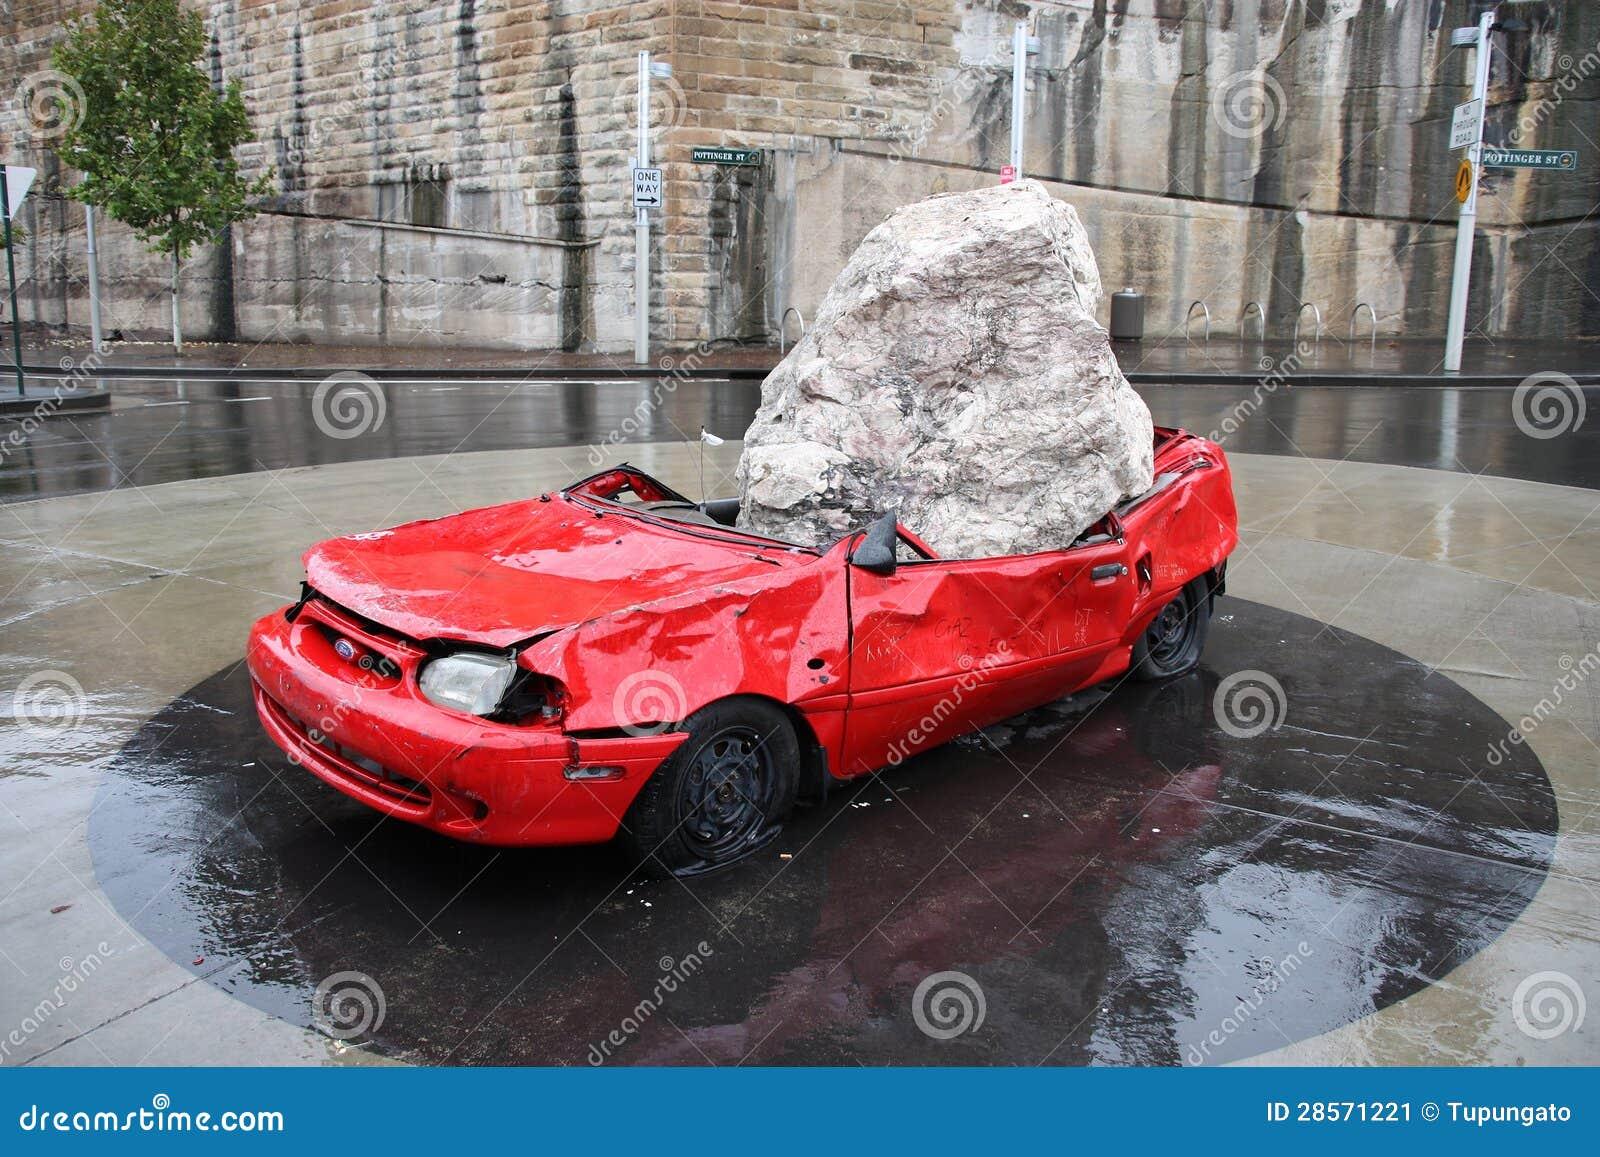 Sydney machacó la escultura del coche